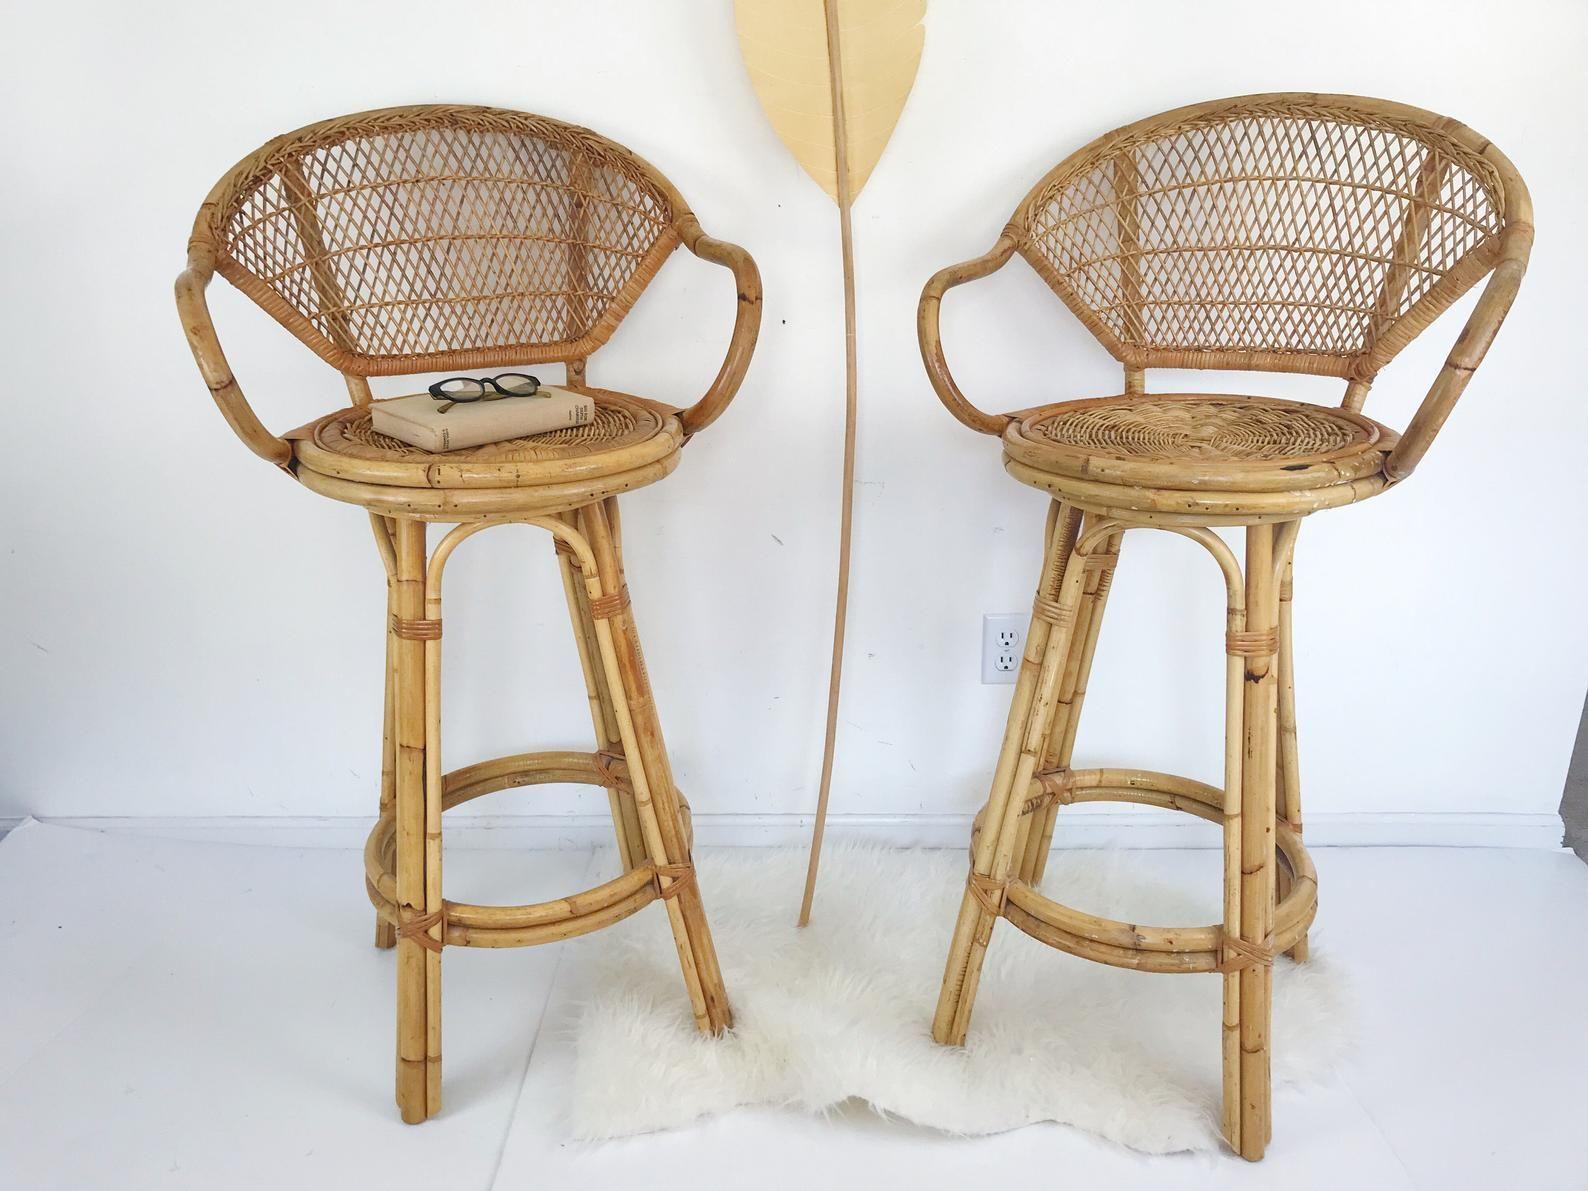 Vintage Swivel Bar Stools Bamboo Rattan Franco Albini Style Etsy In 2020 Swivel Bar Stools Bar Stools Rattan Bar Stools